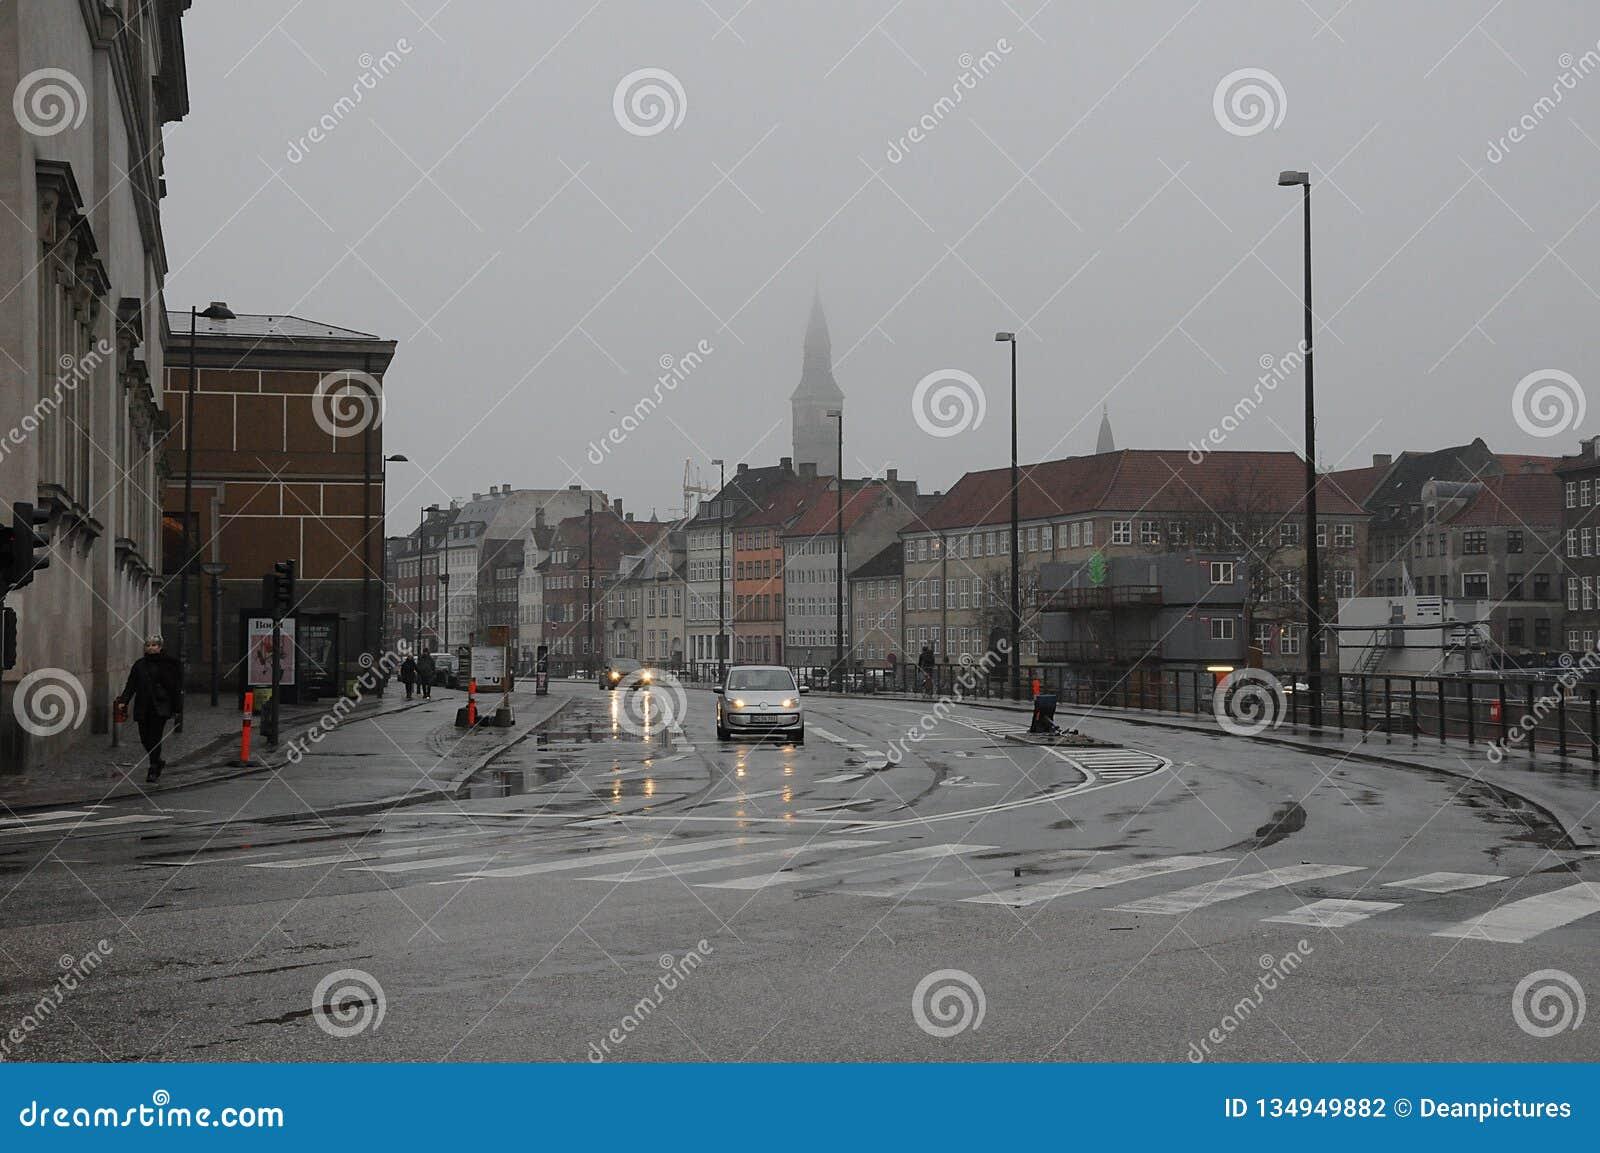 City Of Copenhagen And Rainy Foggy Weather Editorial Photography